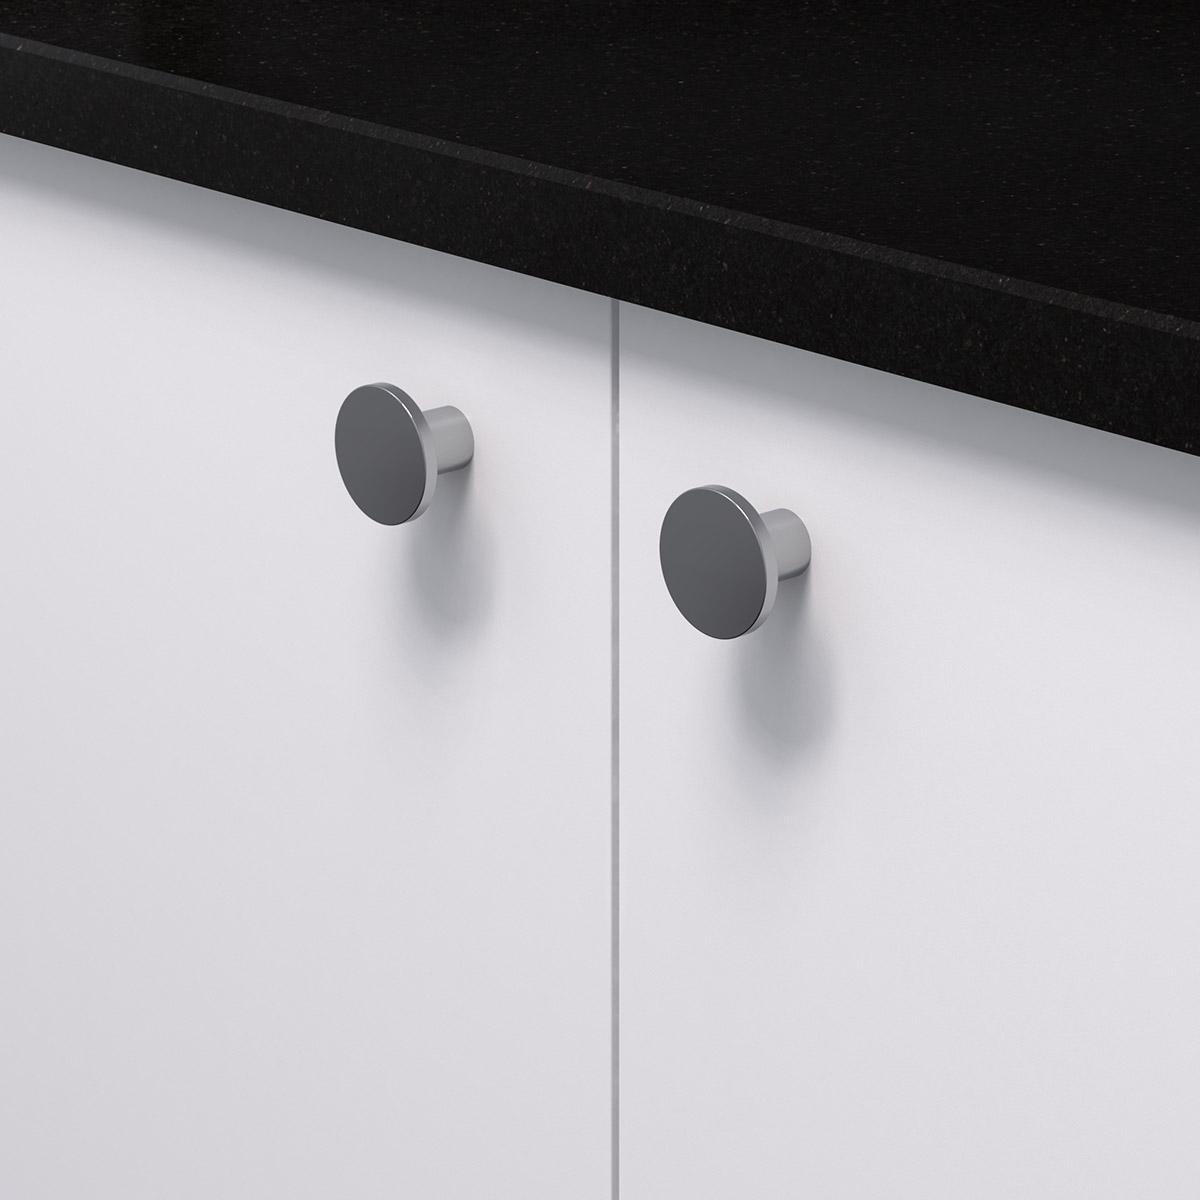 Knopp como krom 343275 11 26 mm ncs s 0300 n granit svart